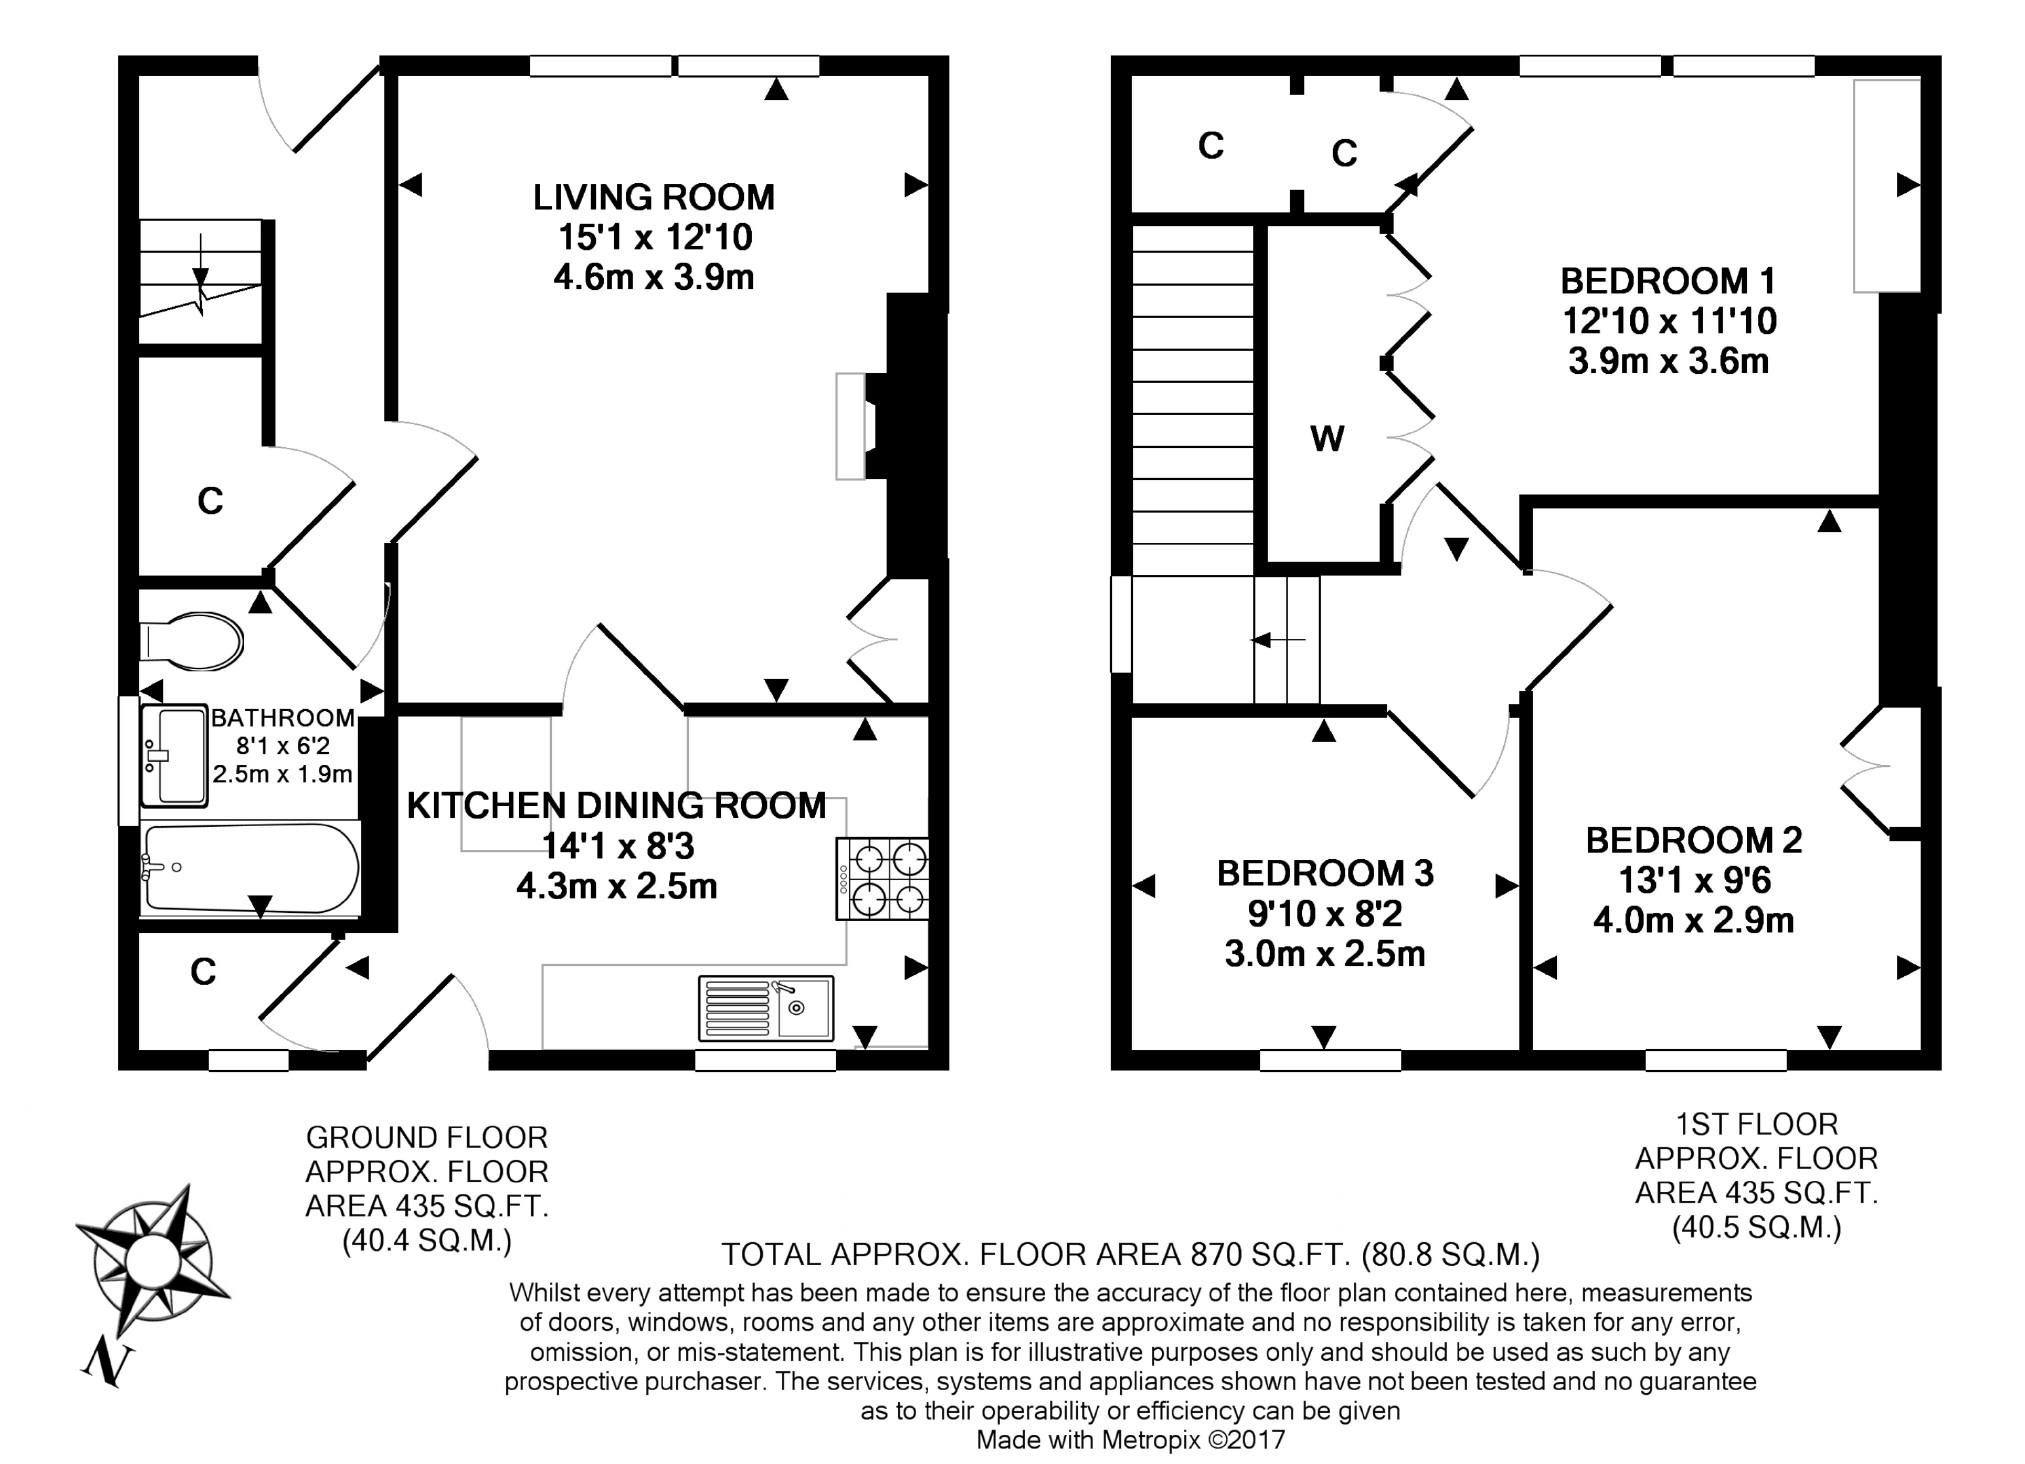 2 castelia castle floor plan by 100 castle floor for Castle rock floor plans